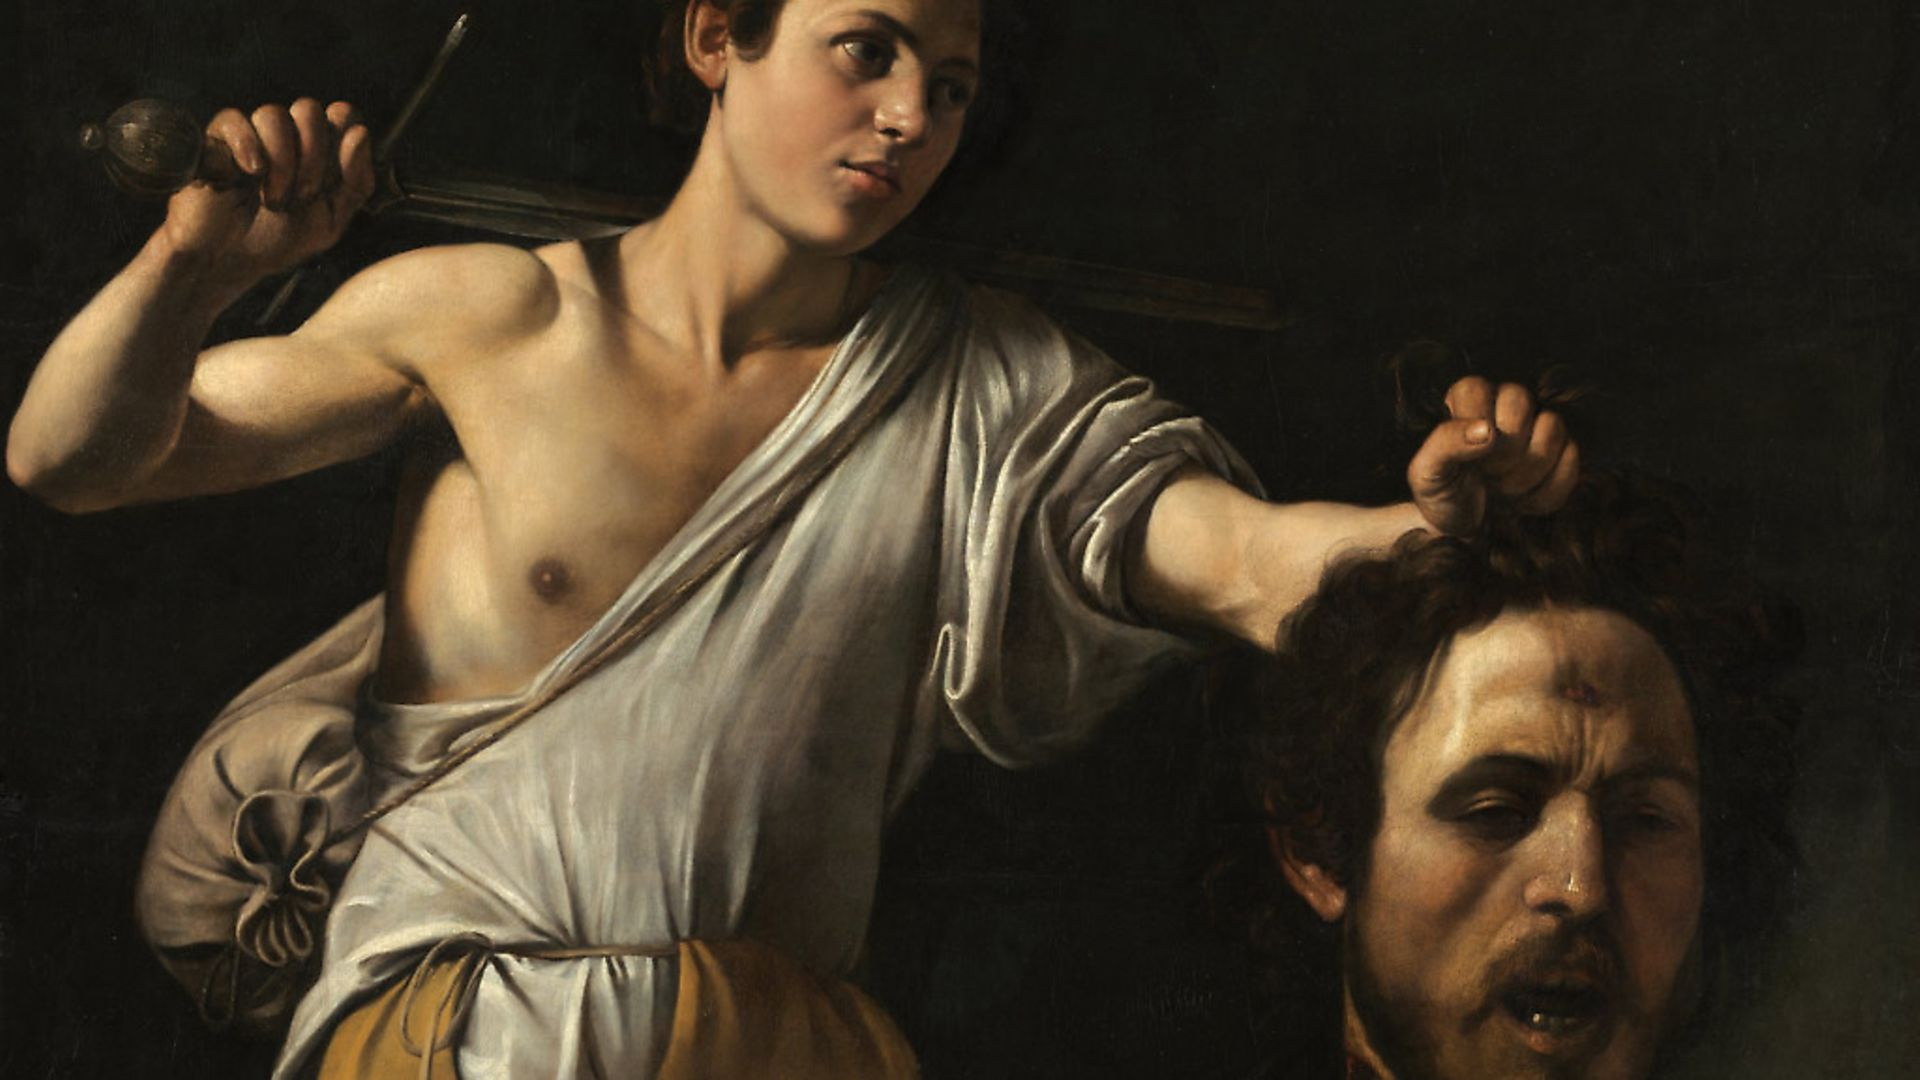 Michelangelo Merisi da Caravaggio, David with the Head of Goliath. Picture: KHM-Museumsverband - Credit: Archant